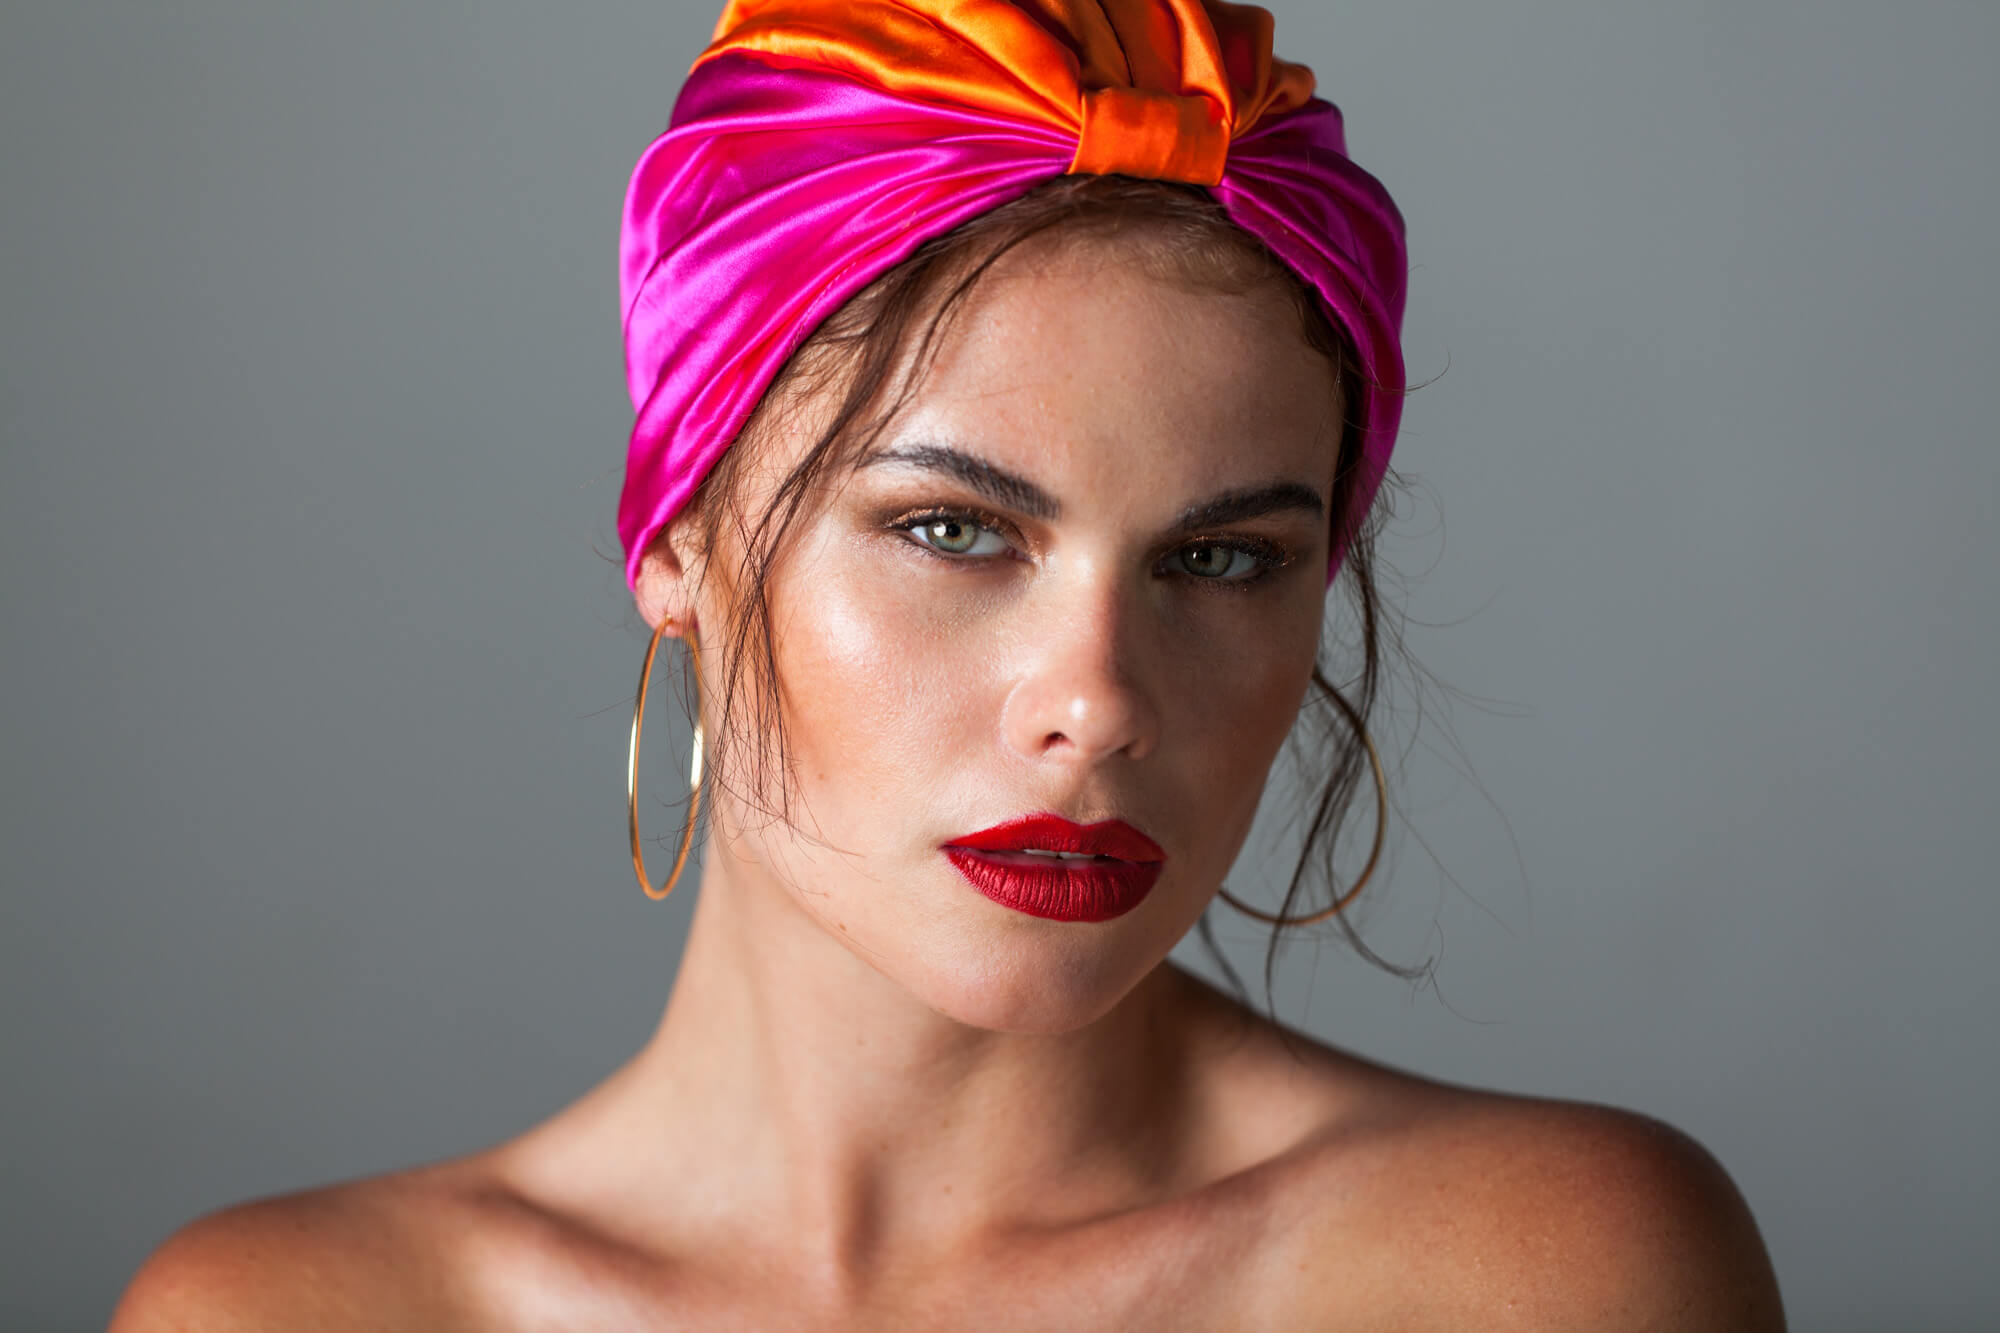 Turban, Dorset- Beauty photographer